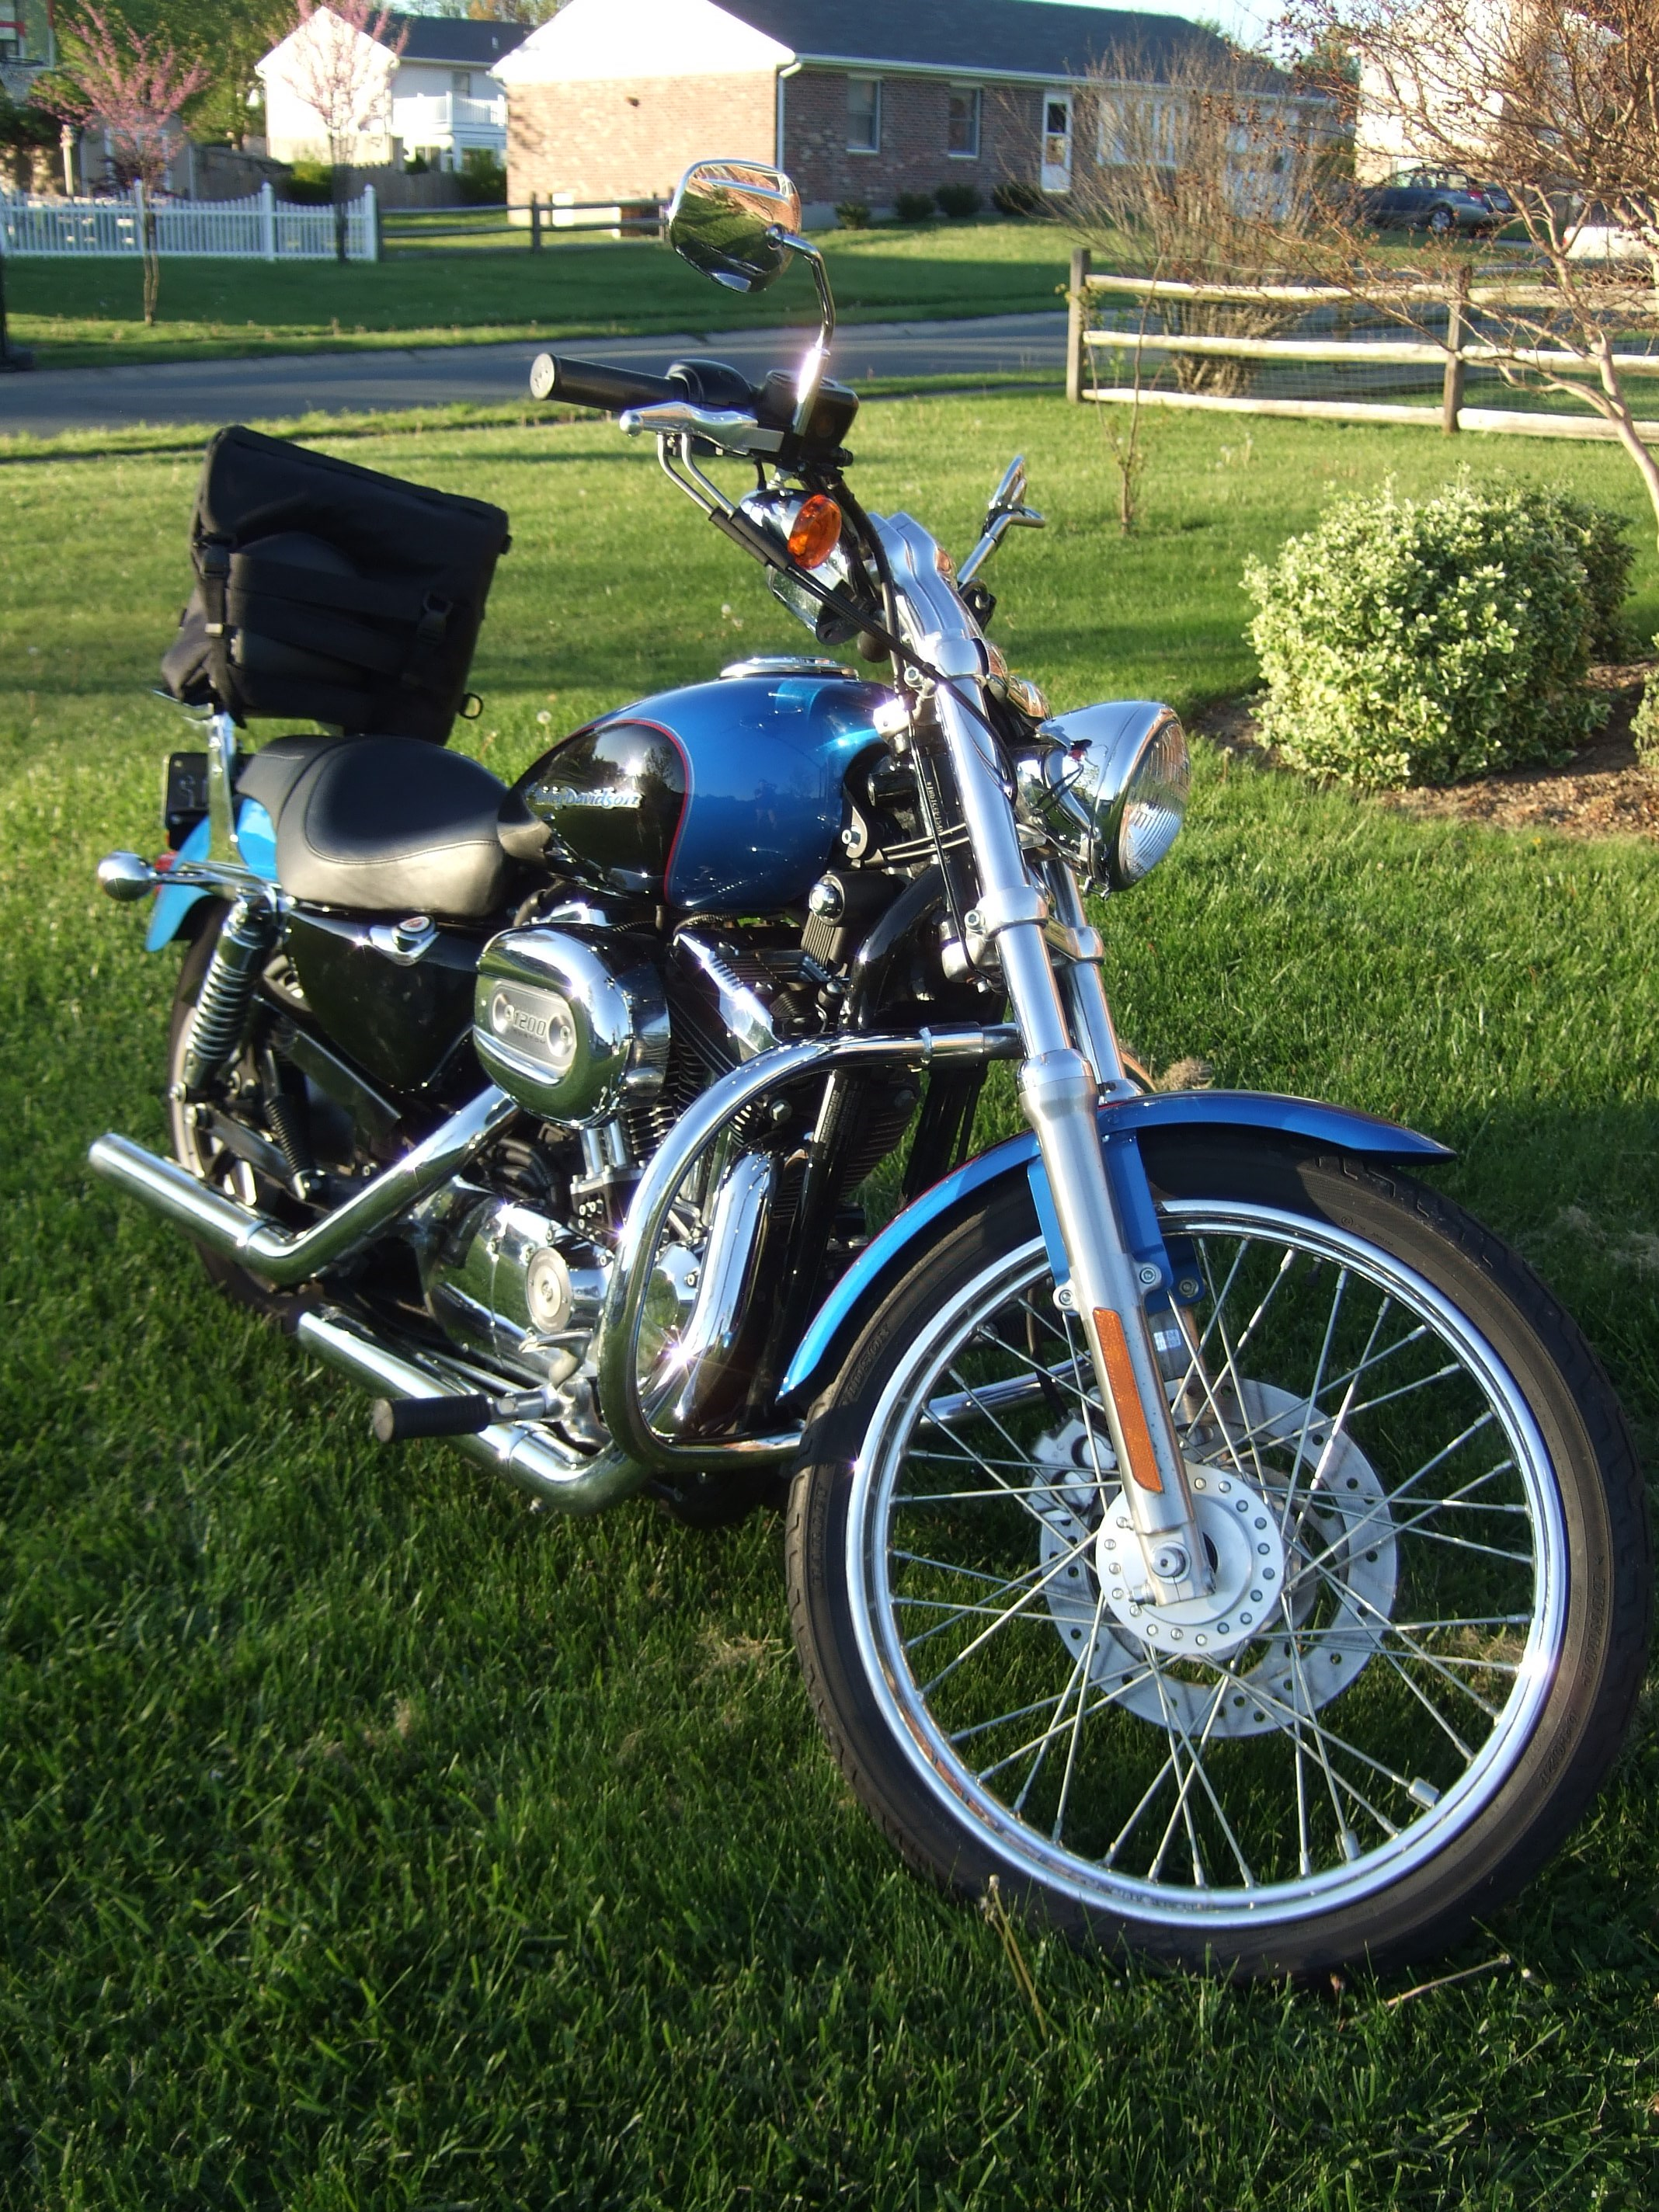 Harley Davidson Sportster Craigslist Nj